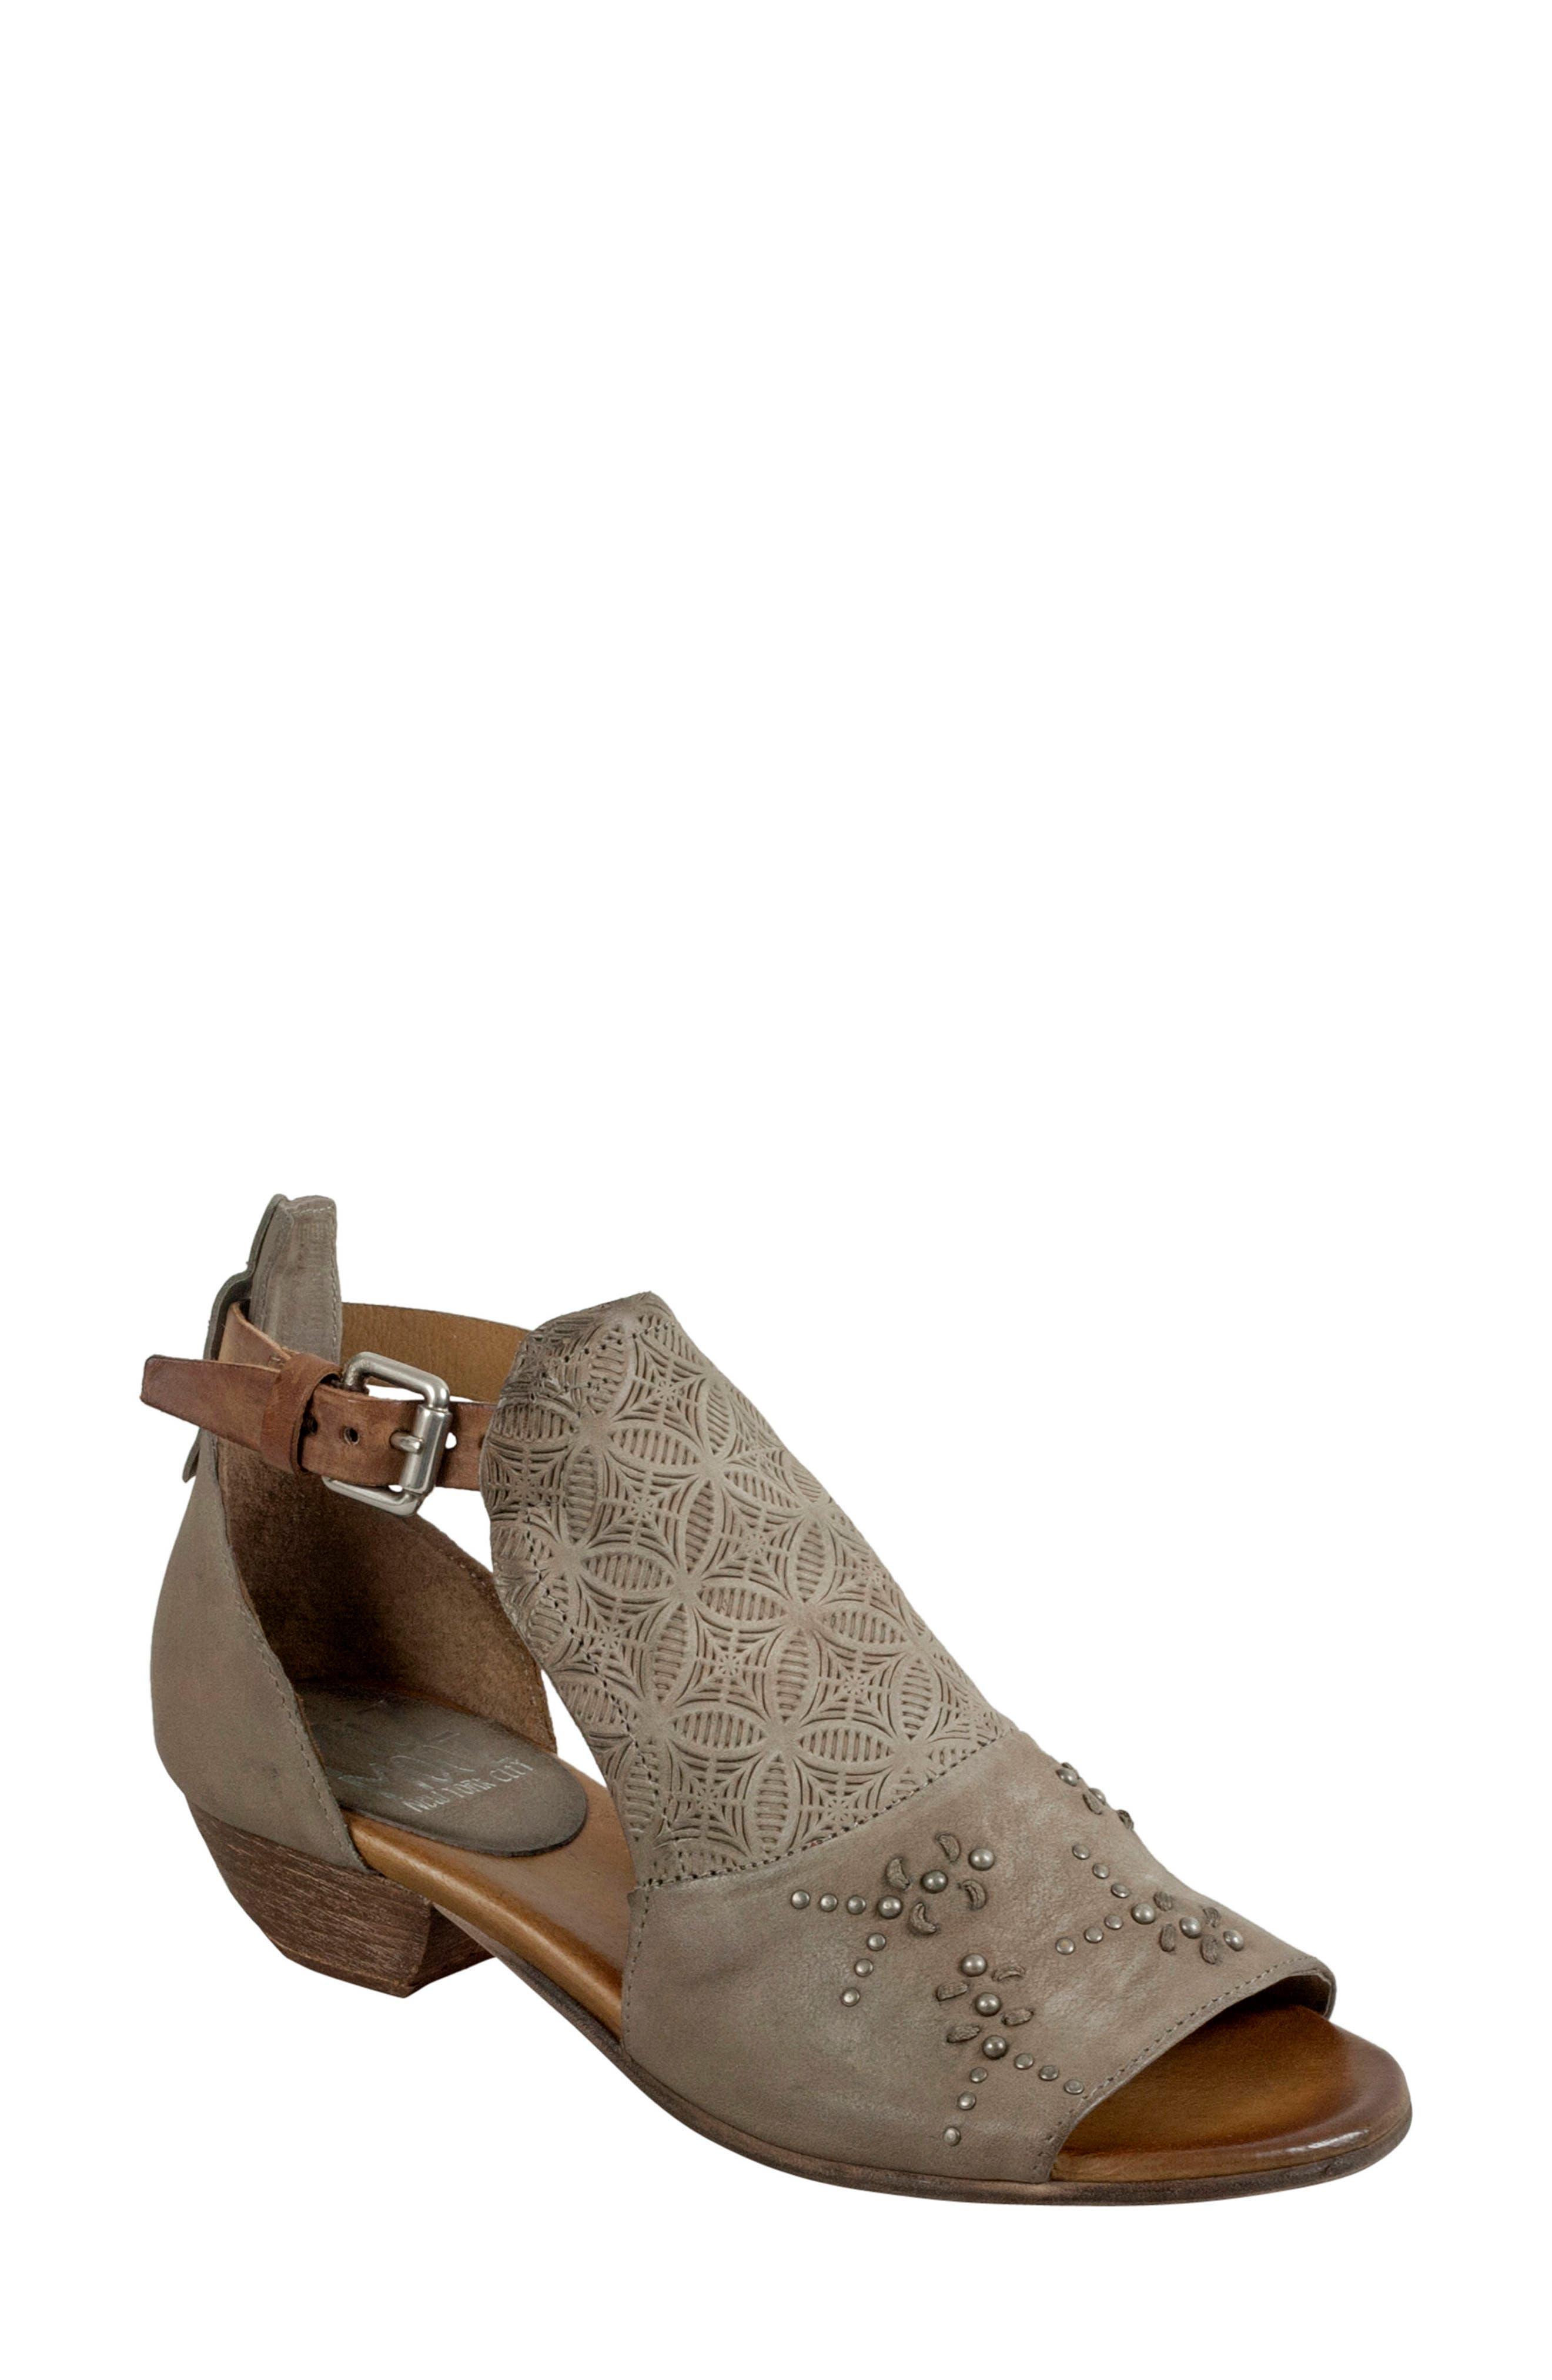 Miz Mooz Carey Embellished Sandal (Women)